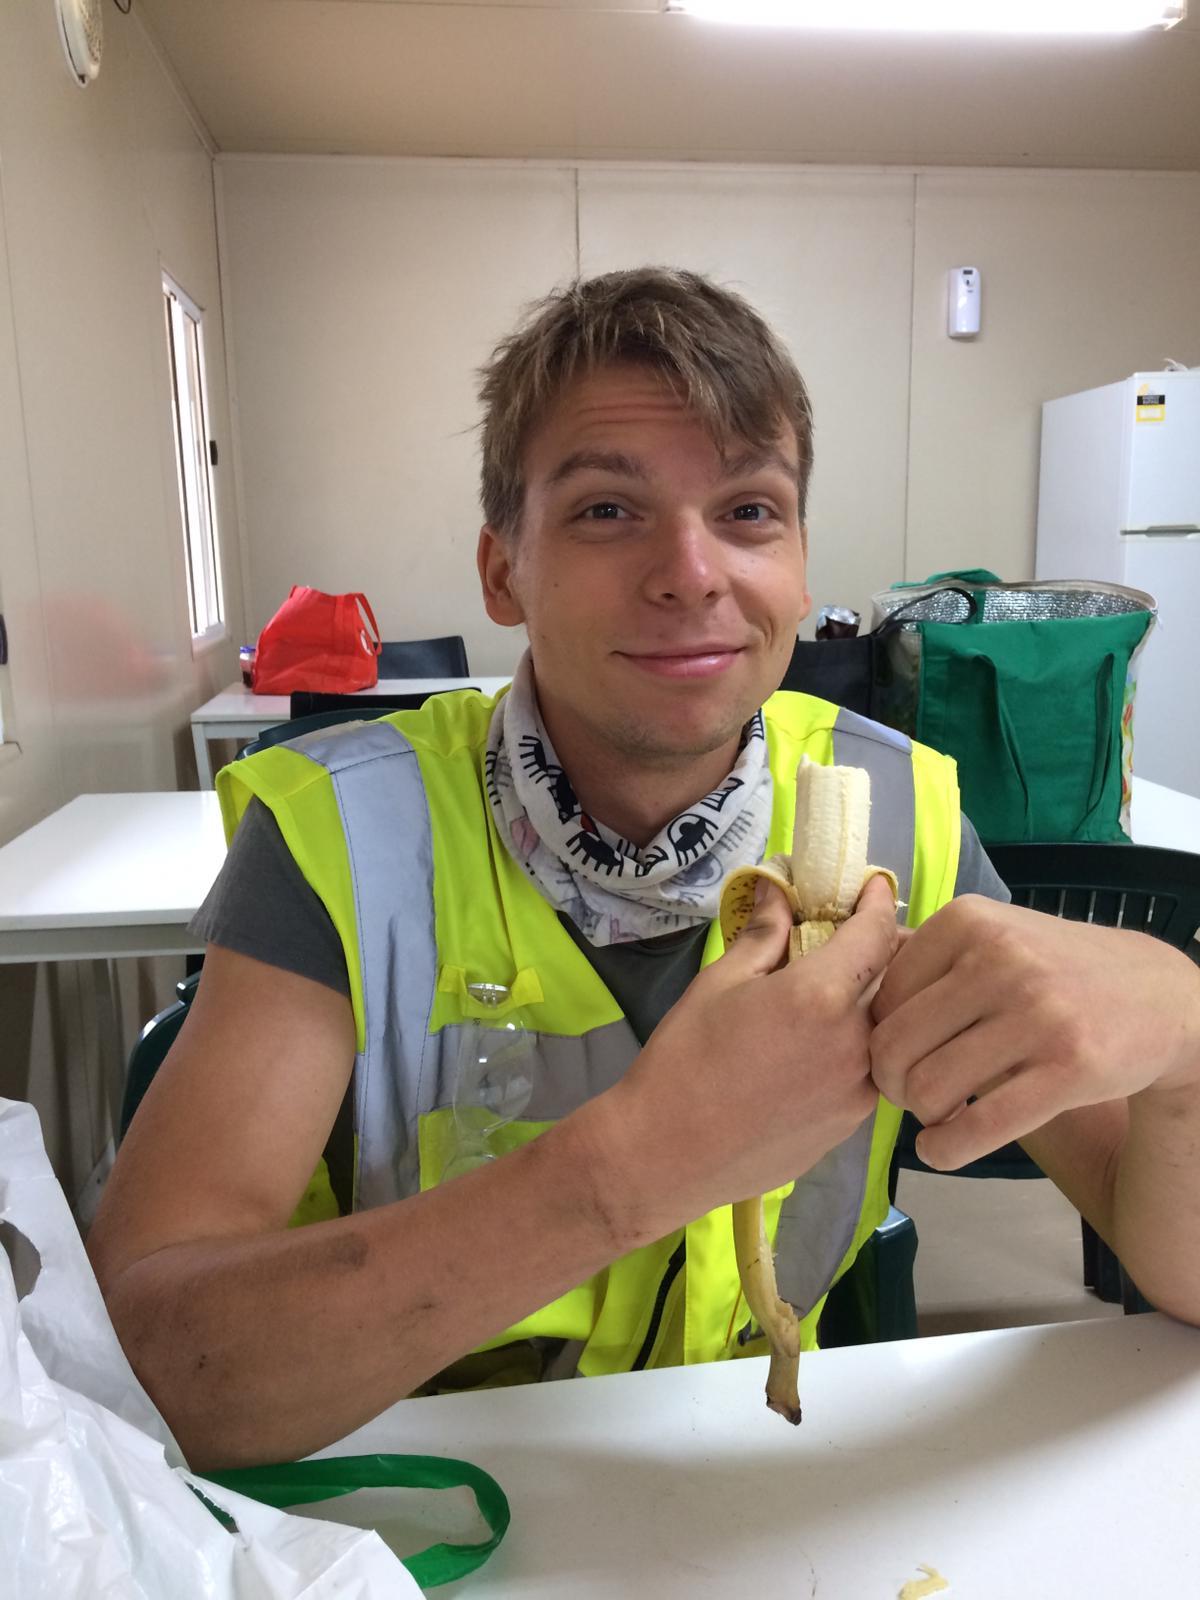 Marcel mit Banane in dem Pausenraum von Parilla Premium Potatoes